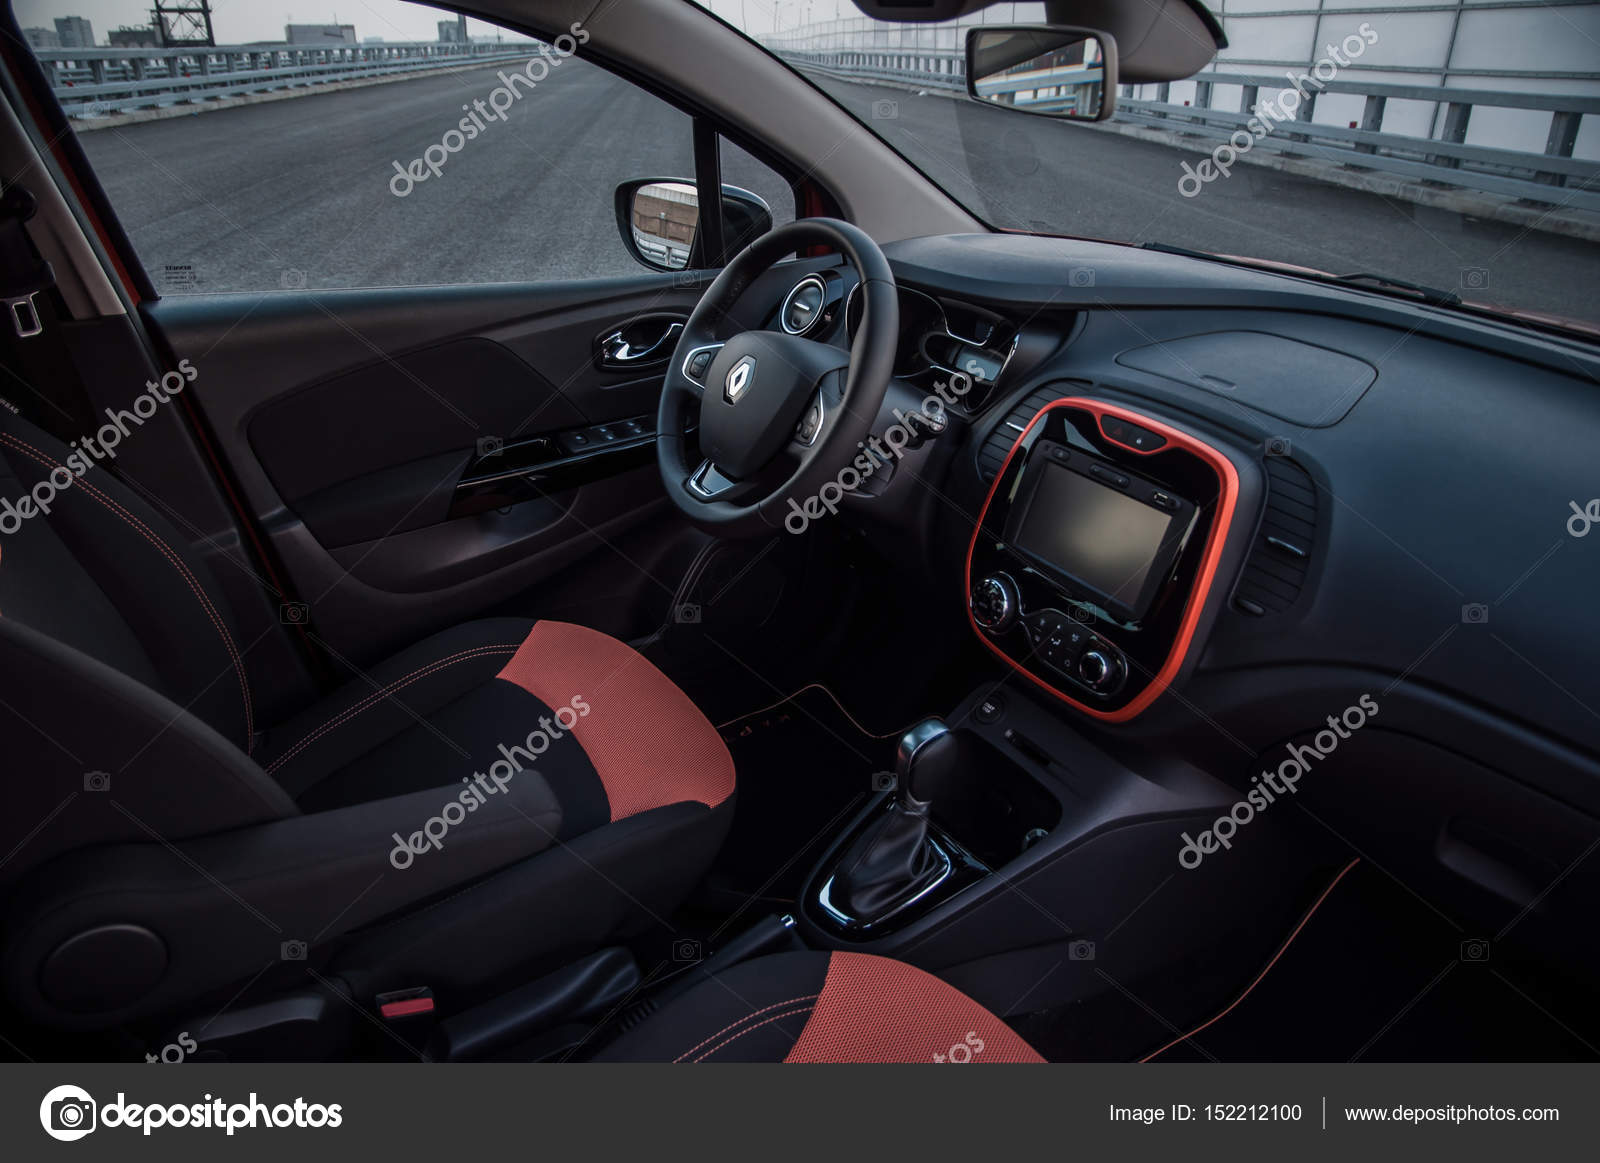 russie moscou 25 juillet 2016 renault kaptur voiture de crossover captur vue int rieure. Black Bedroom Furniture Sets. Home Design Ideas